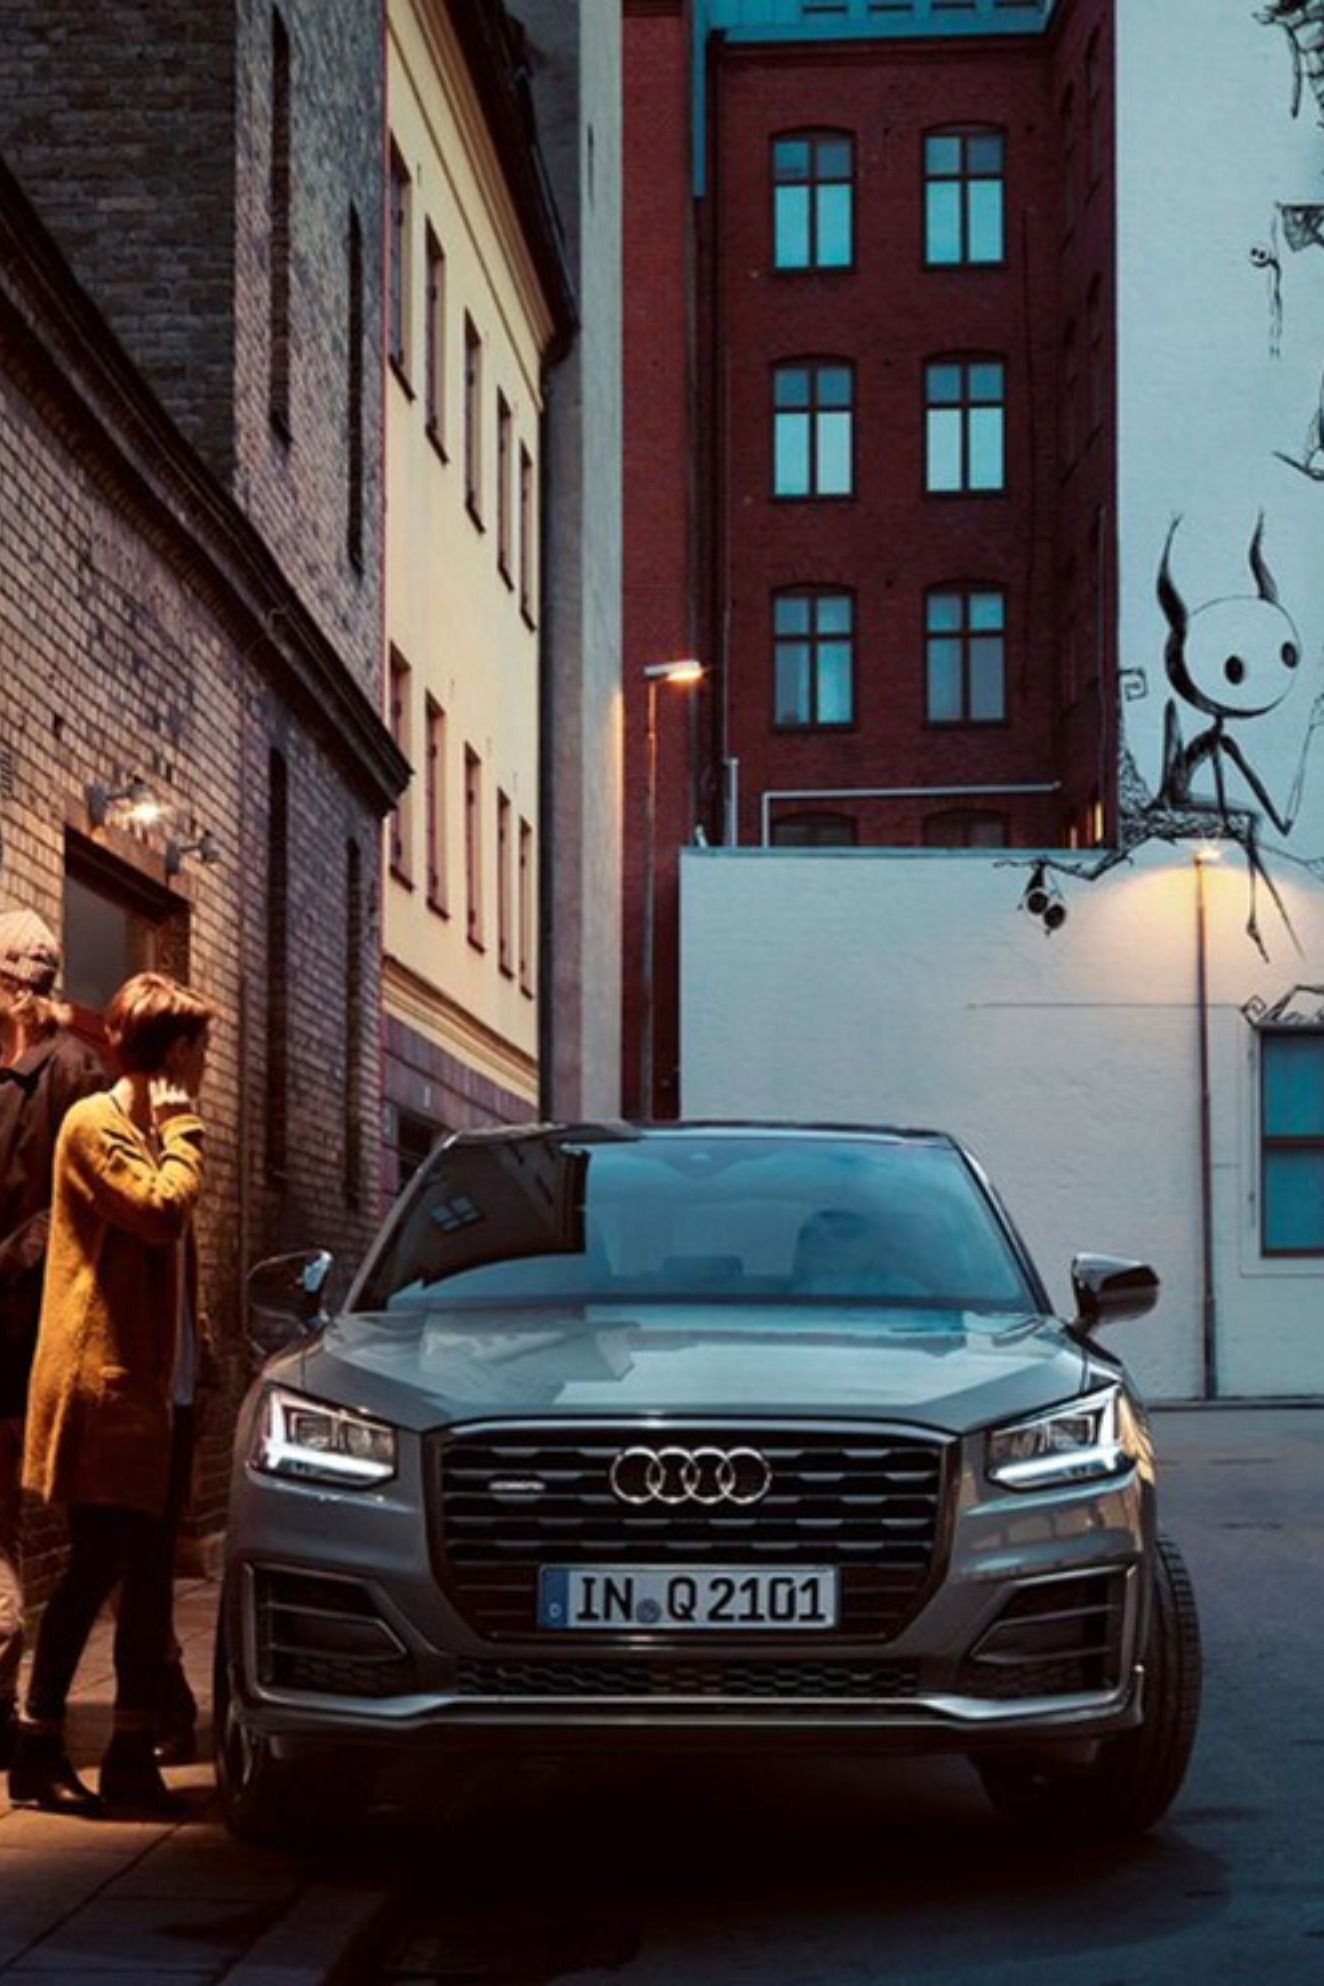 Audi Q2 19 アウディ ポルシェ カイエン カイエン